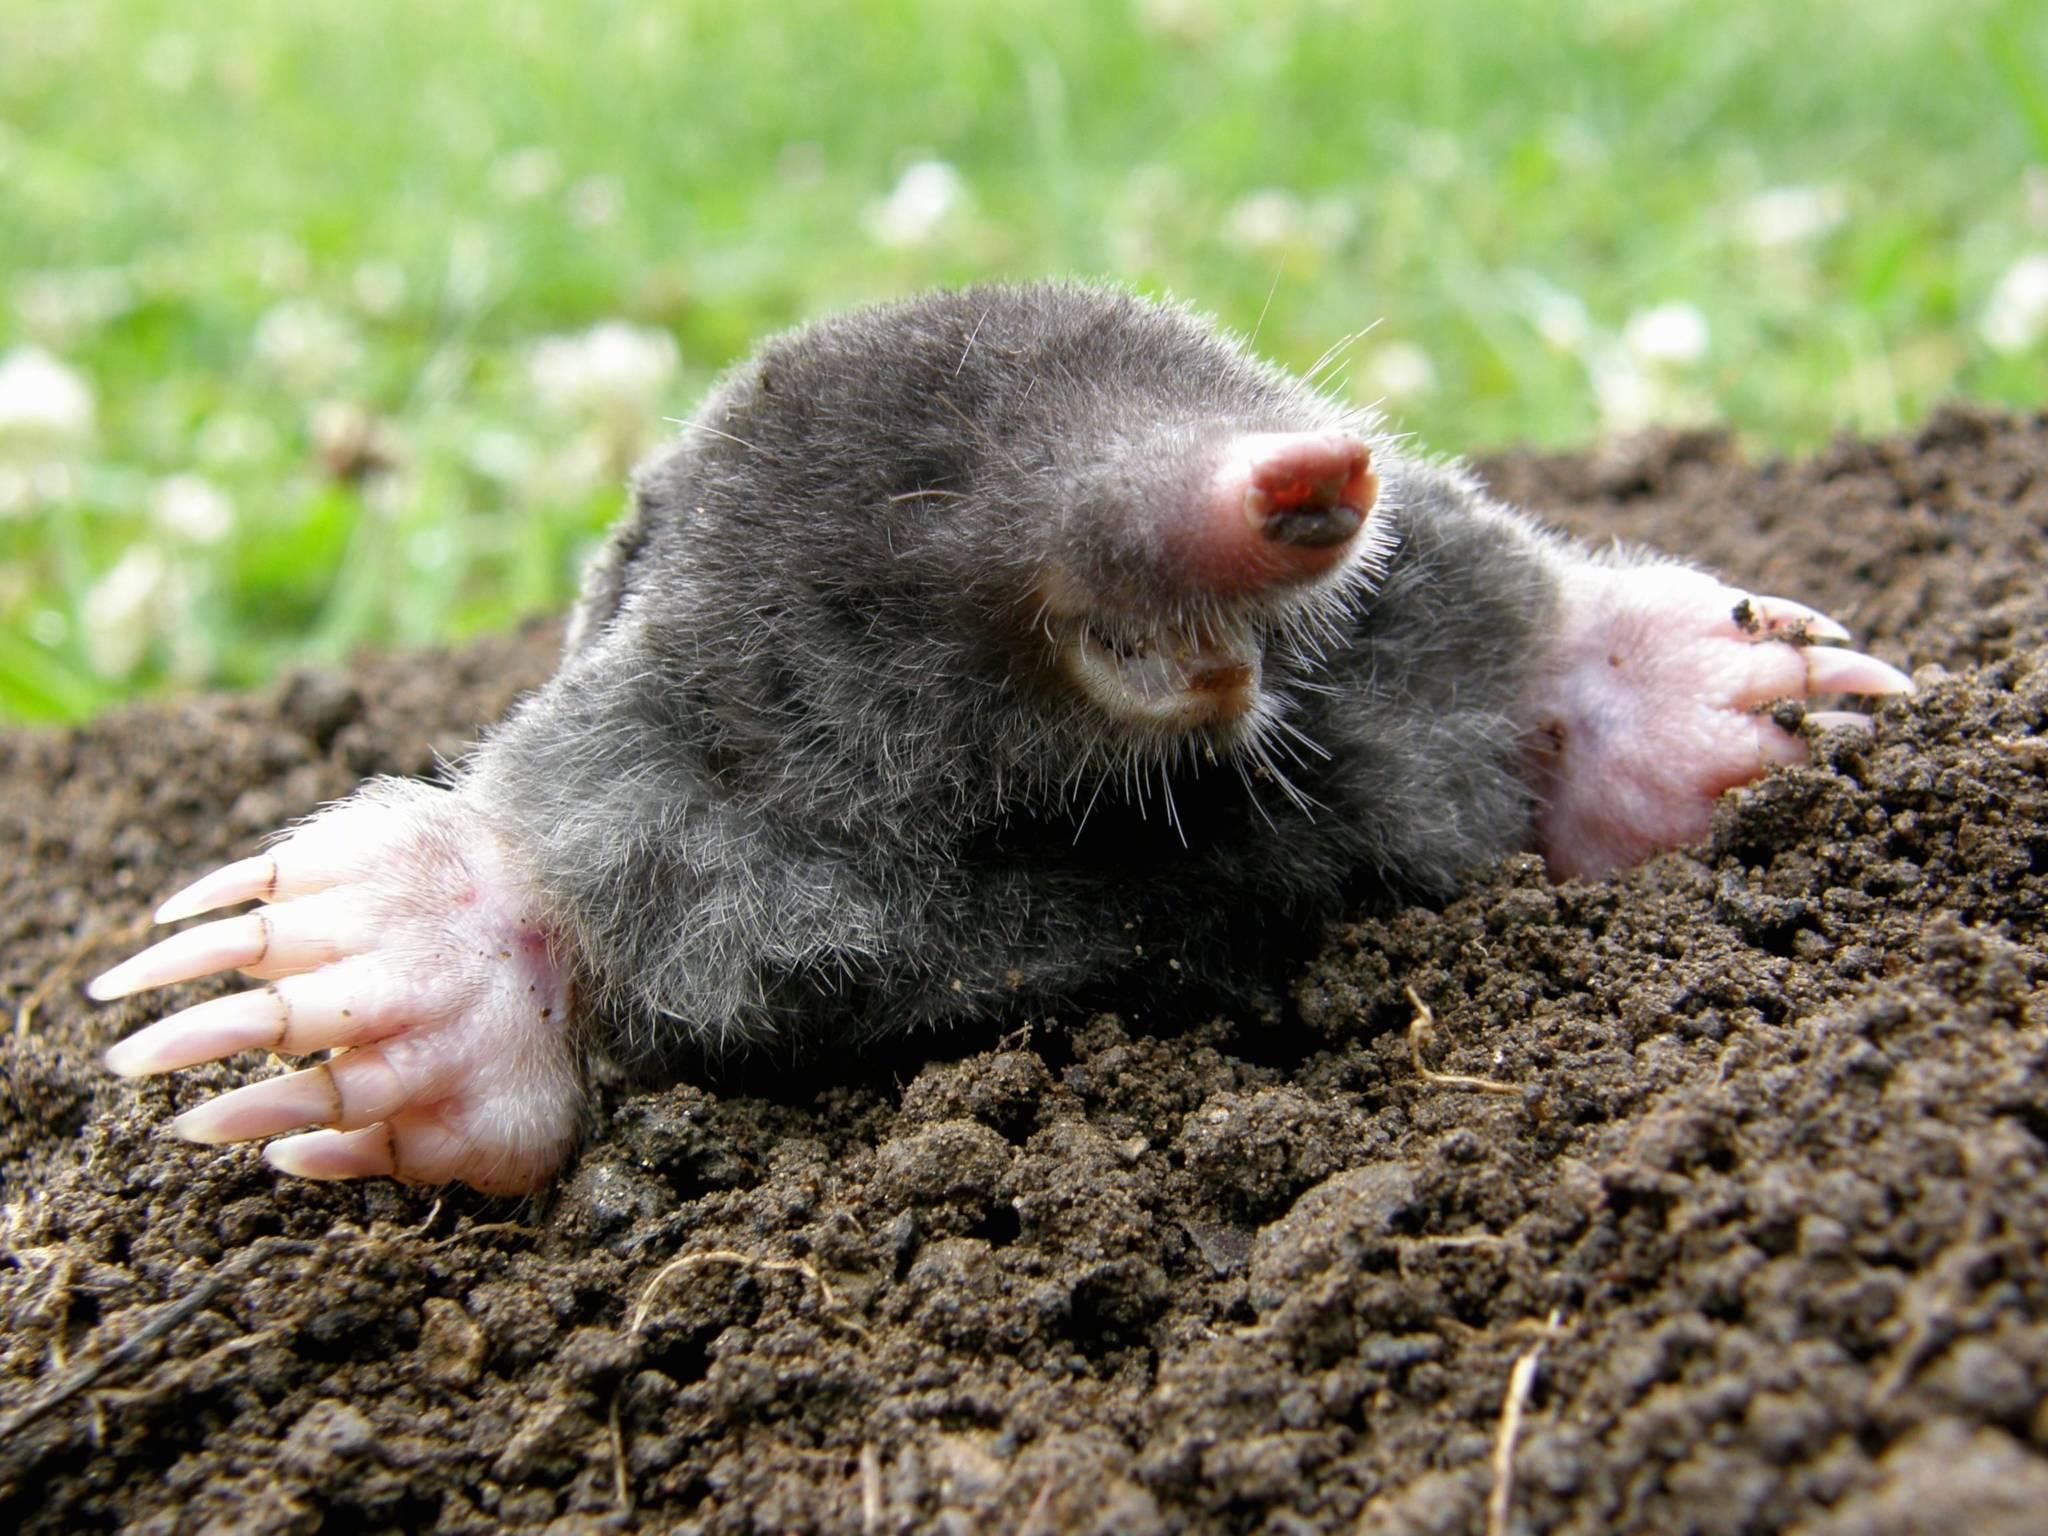 Moles Control Amp Removal Services